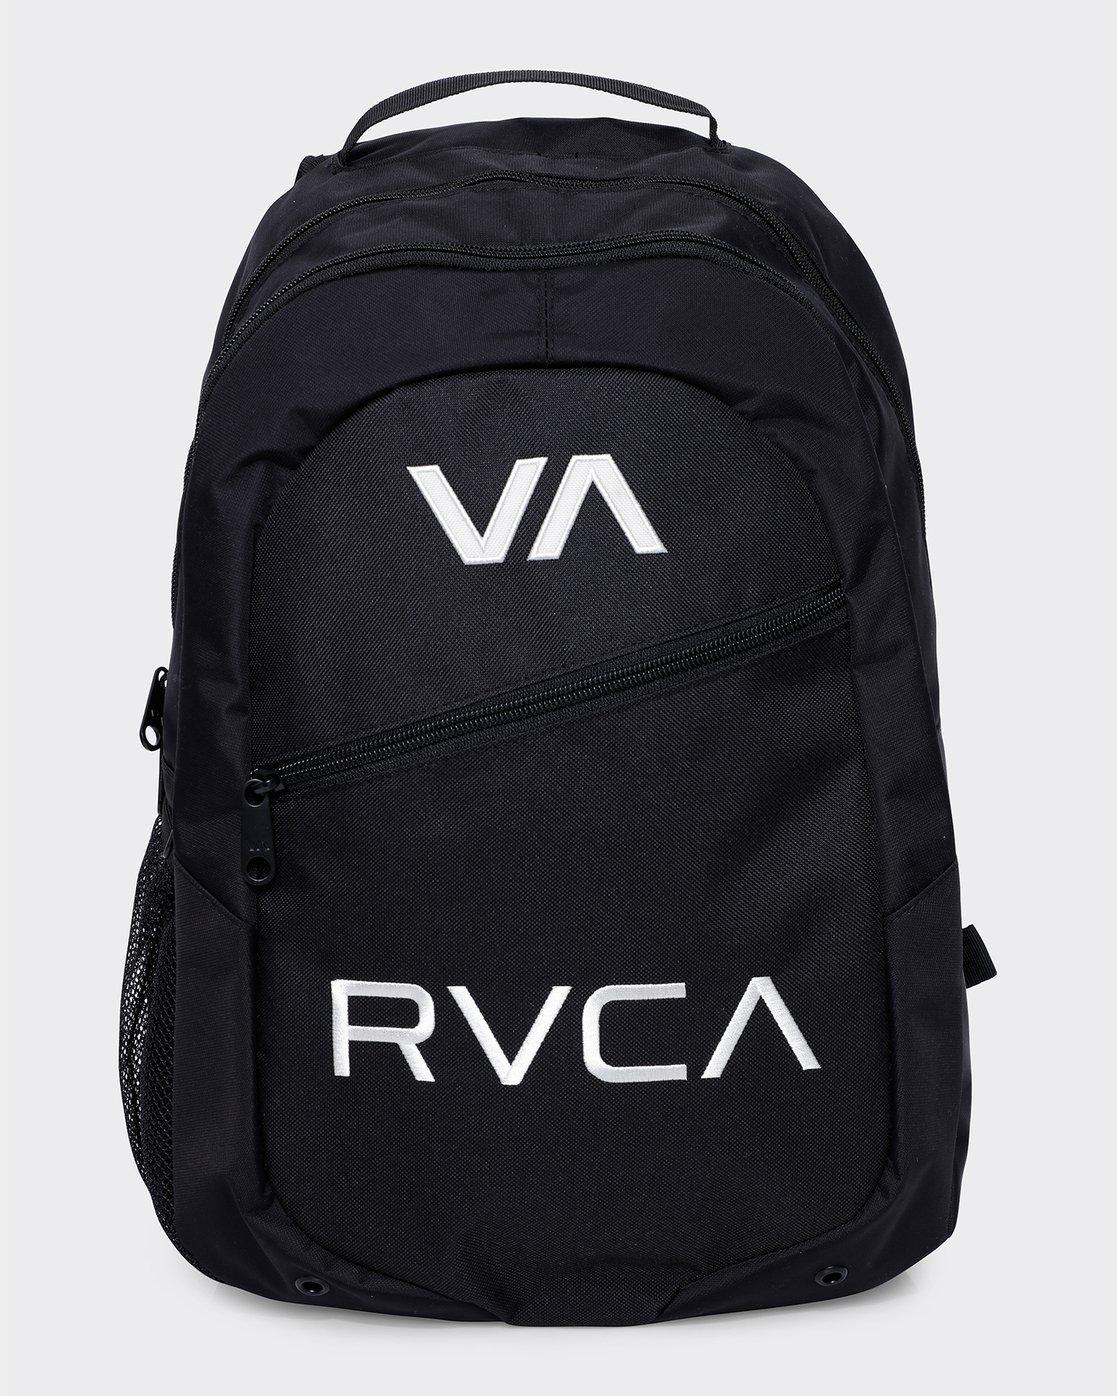 0 RVCA Pack IV Backpack  R332452 RVCA